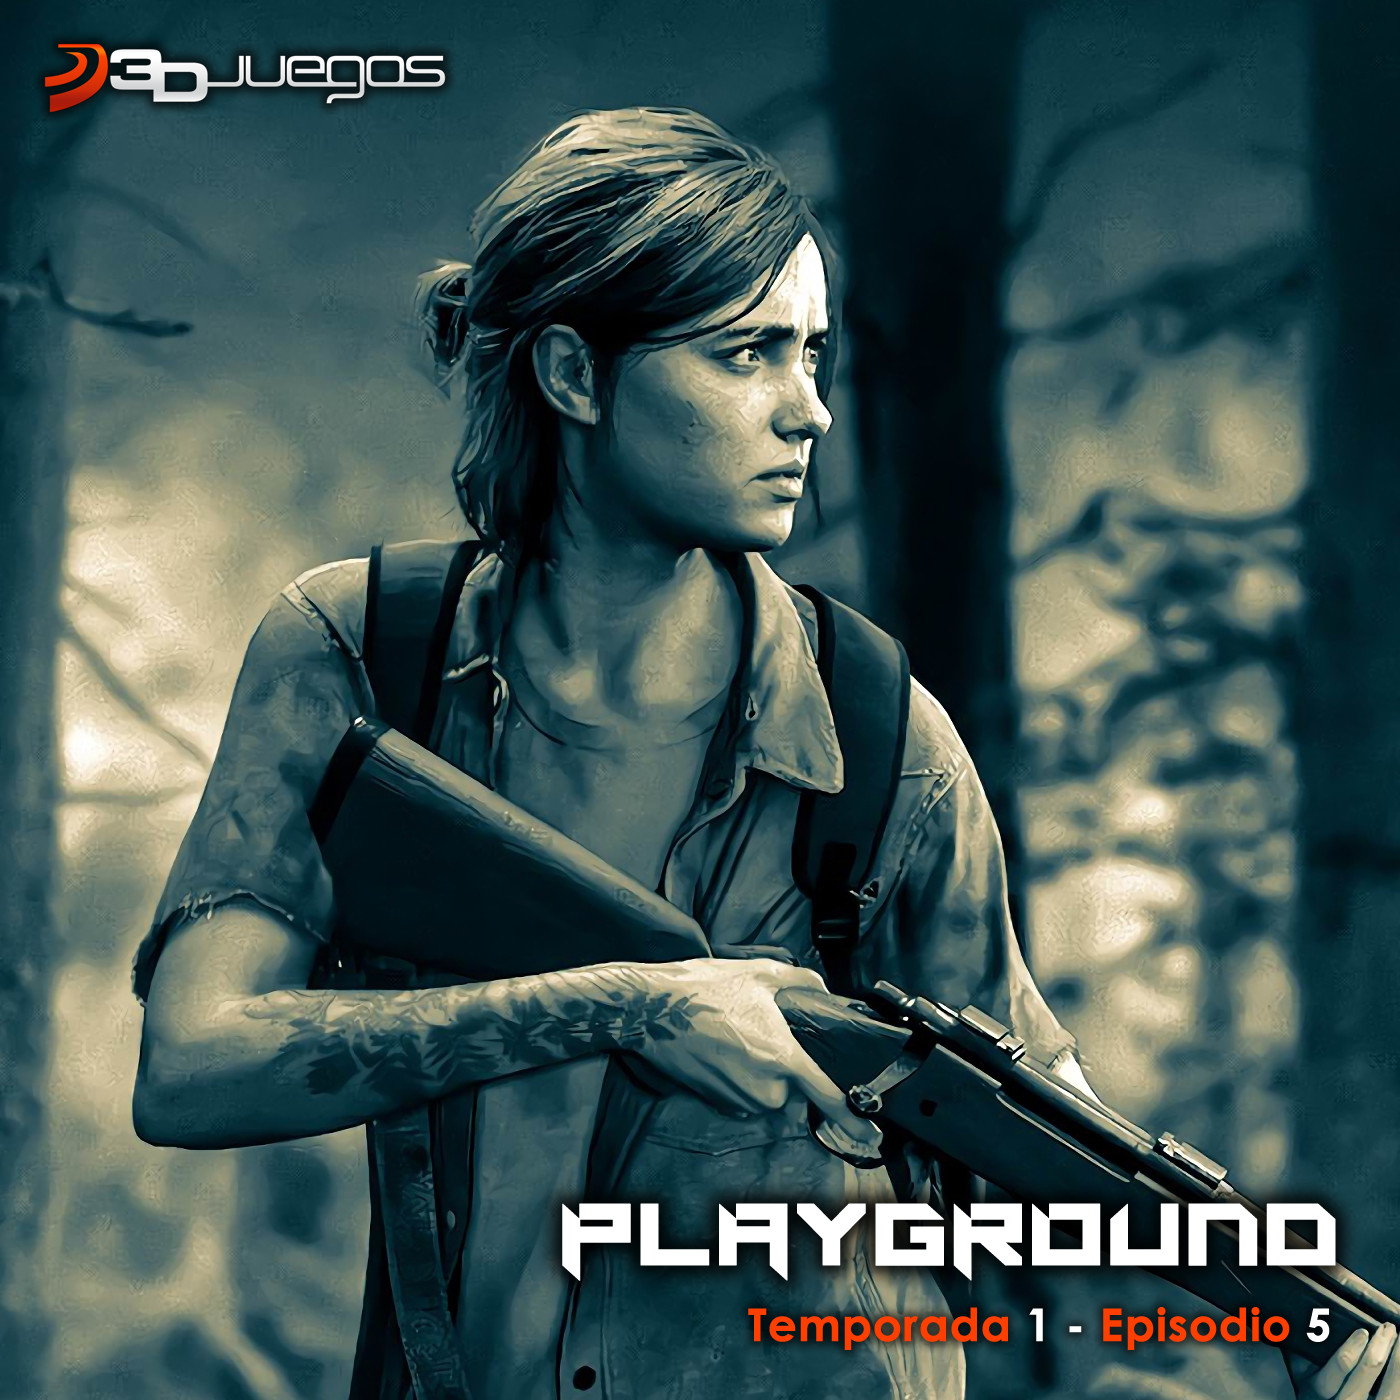 Playground Episodio 05 - The Last of Us Part II se retrasa